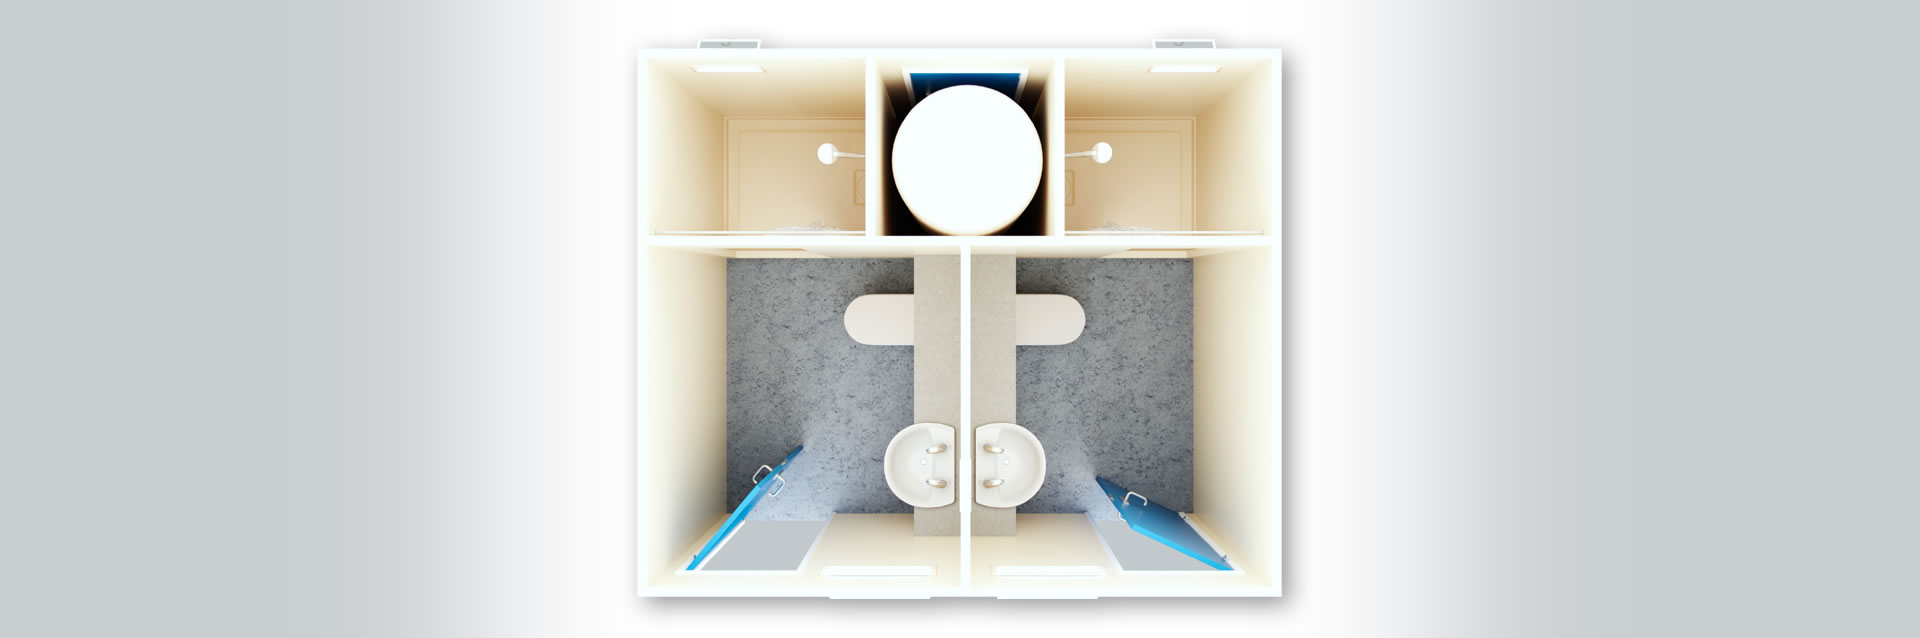 Deluxe Portable Shower & Toilets from Bunkabin